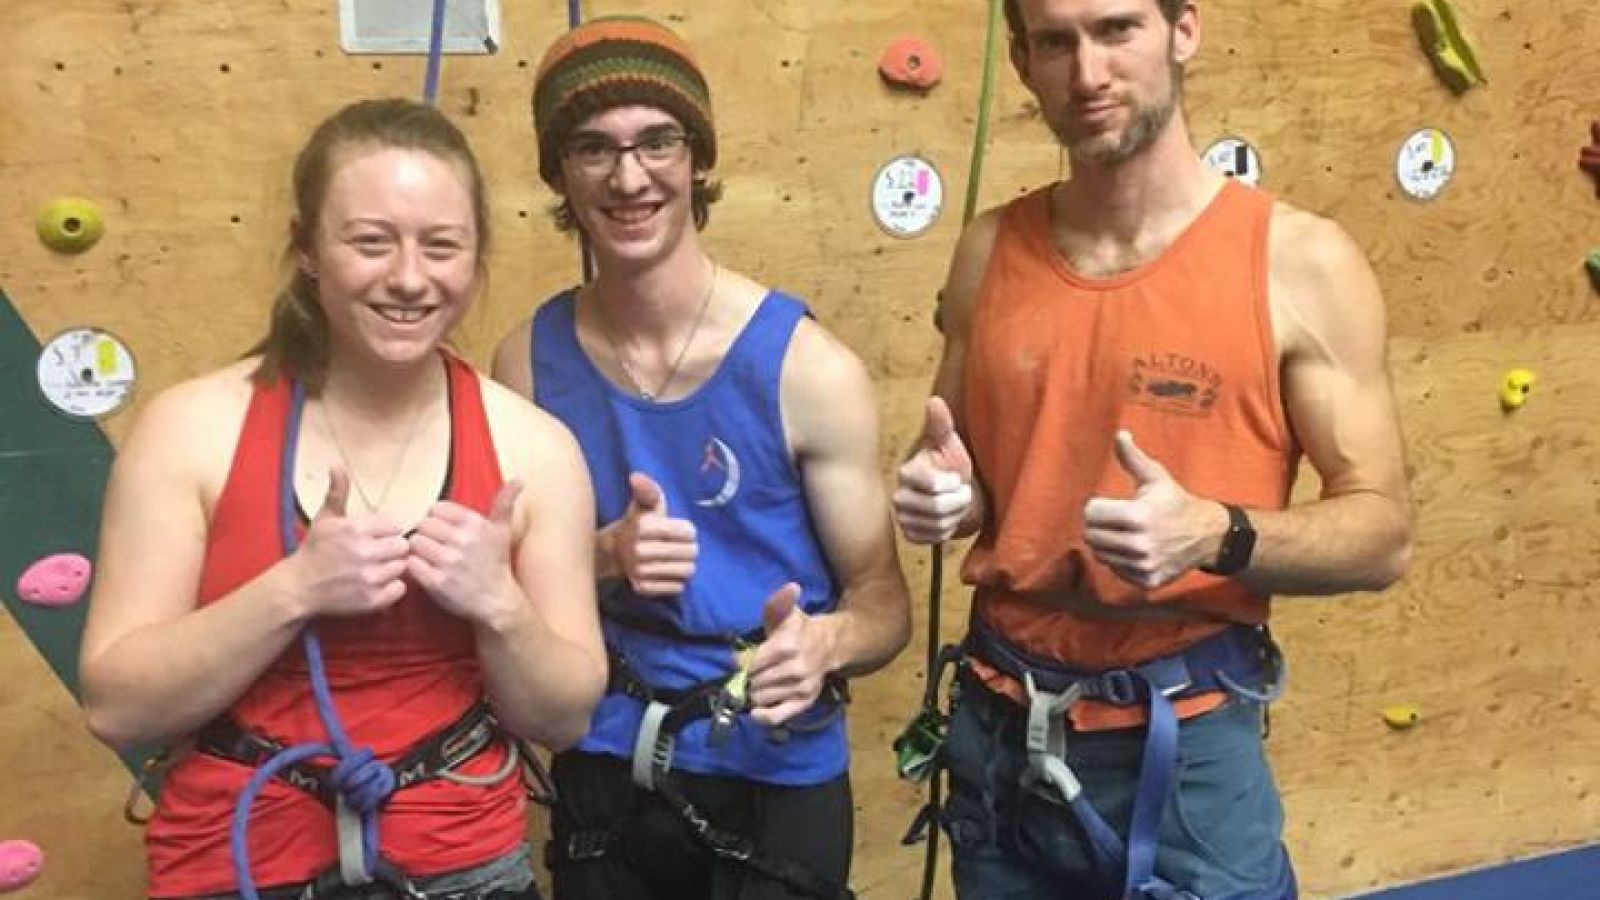 Spirit Rock Climbing Centre